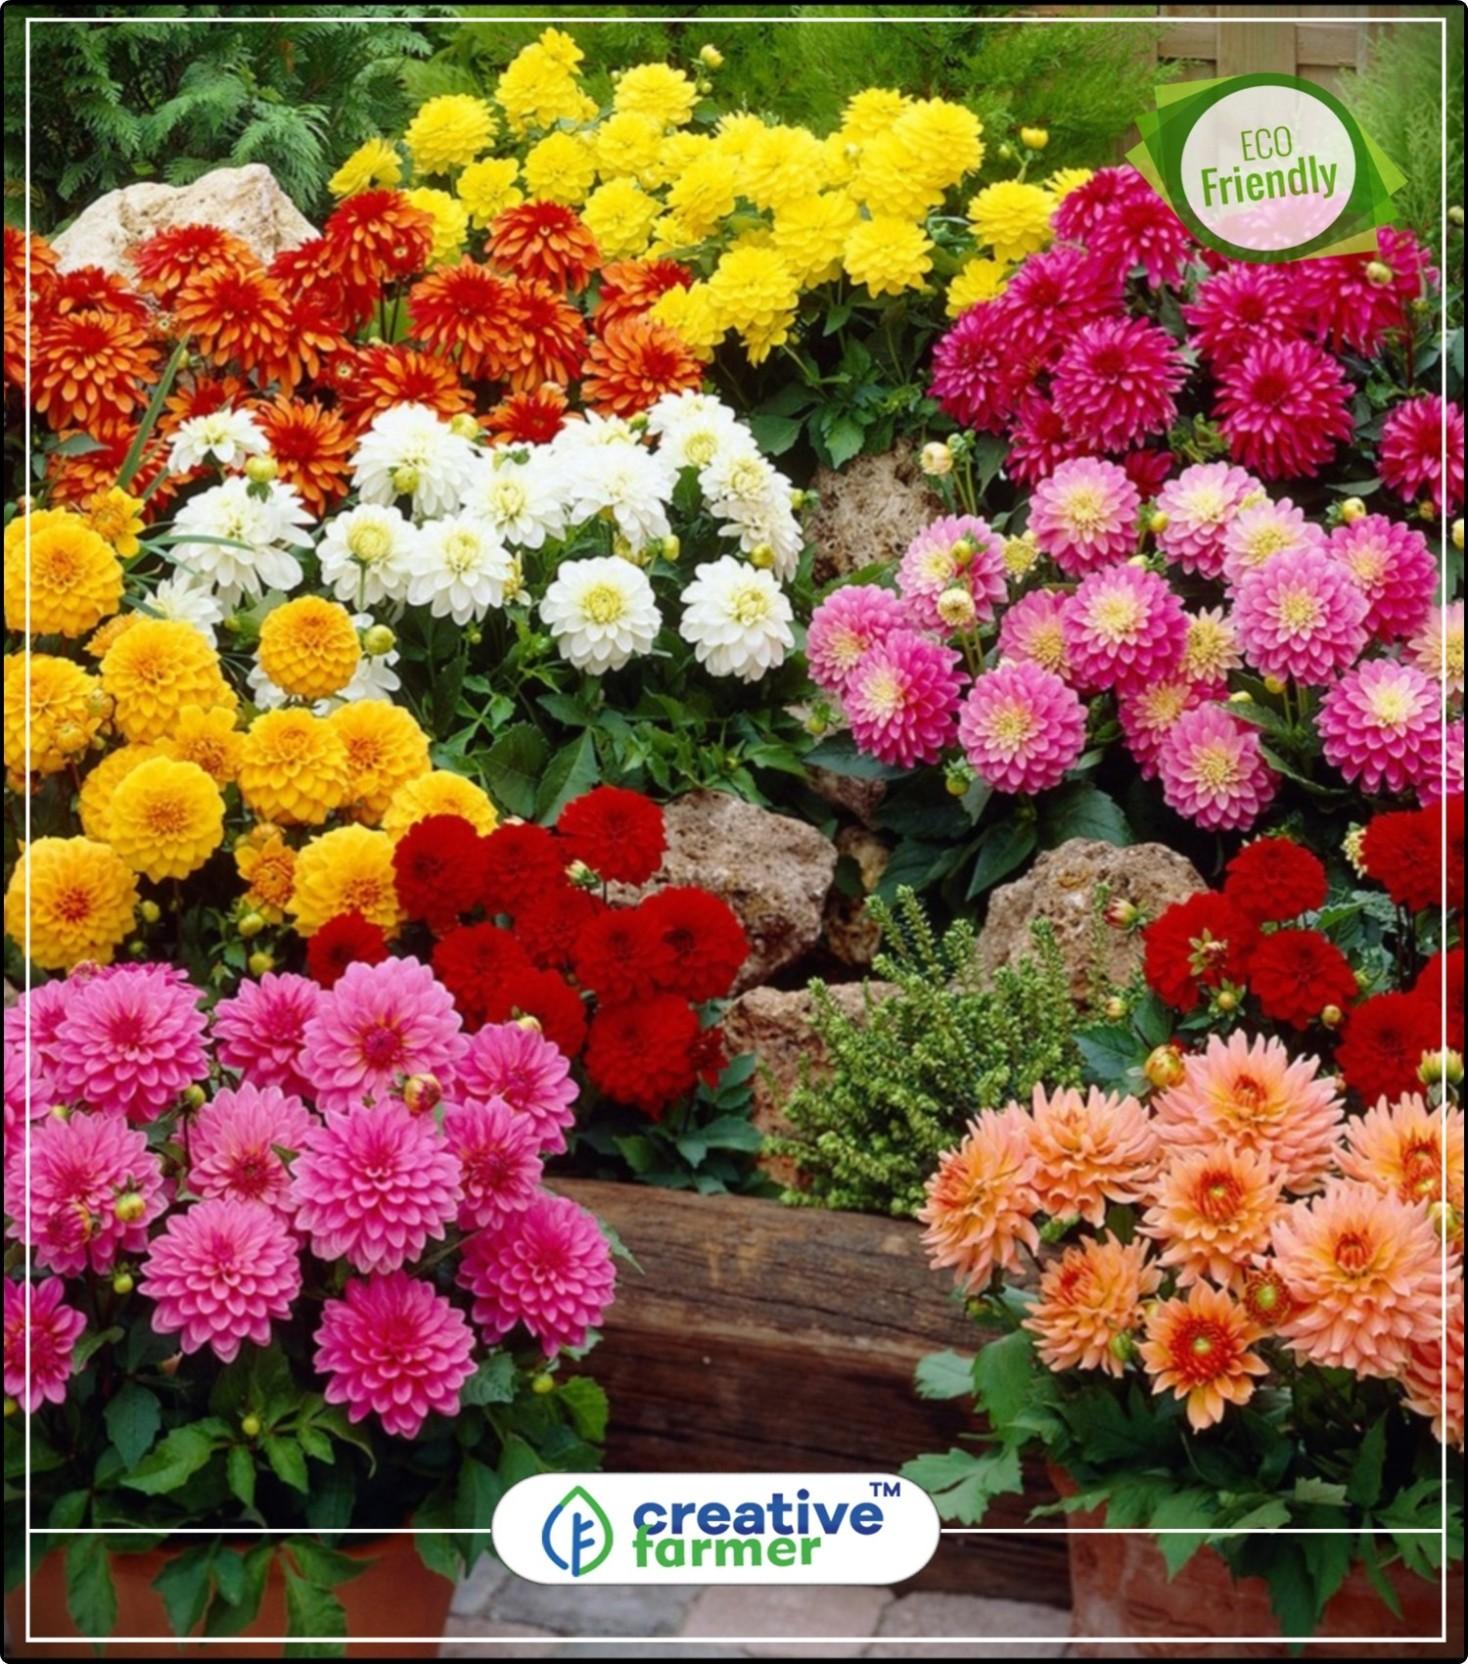 creative farmer dahlia hortensis flower seeds for all season india kitchen  garden plant seeds 20indoor, outdoor kitchen garden plant seeds seed